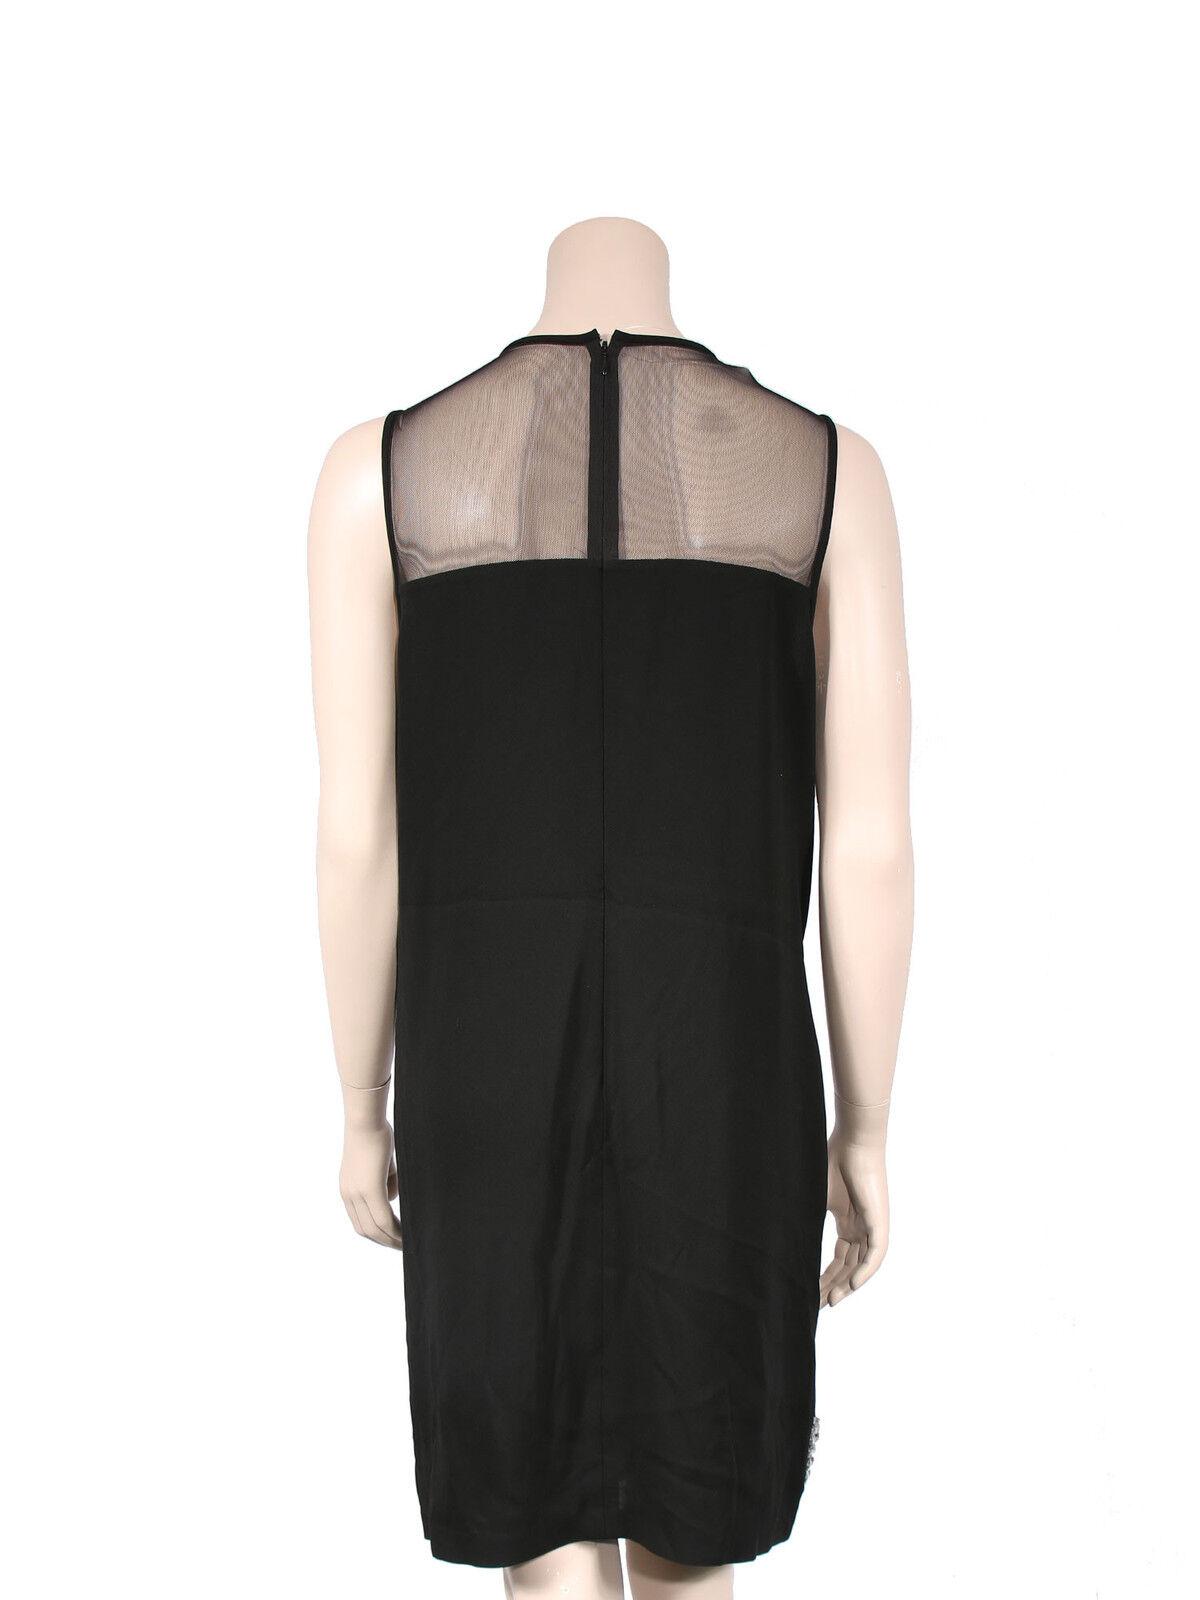 DVF Jewel Dress SIZE SIZE SIZE 12 52e222